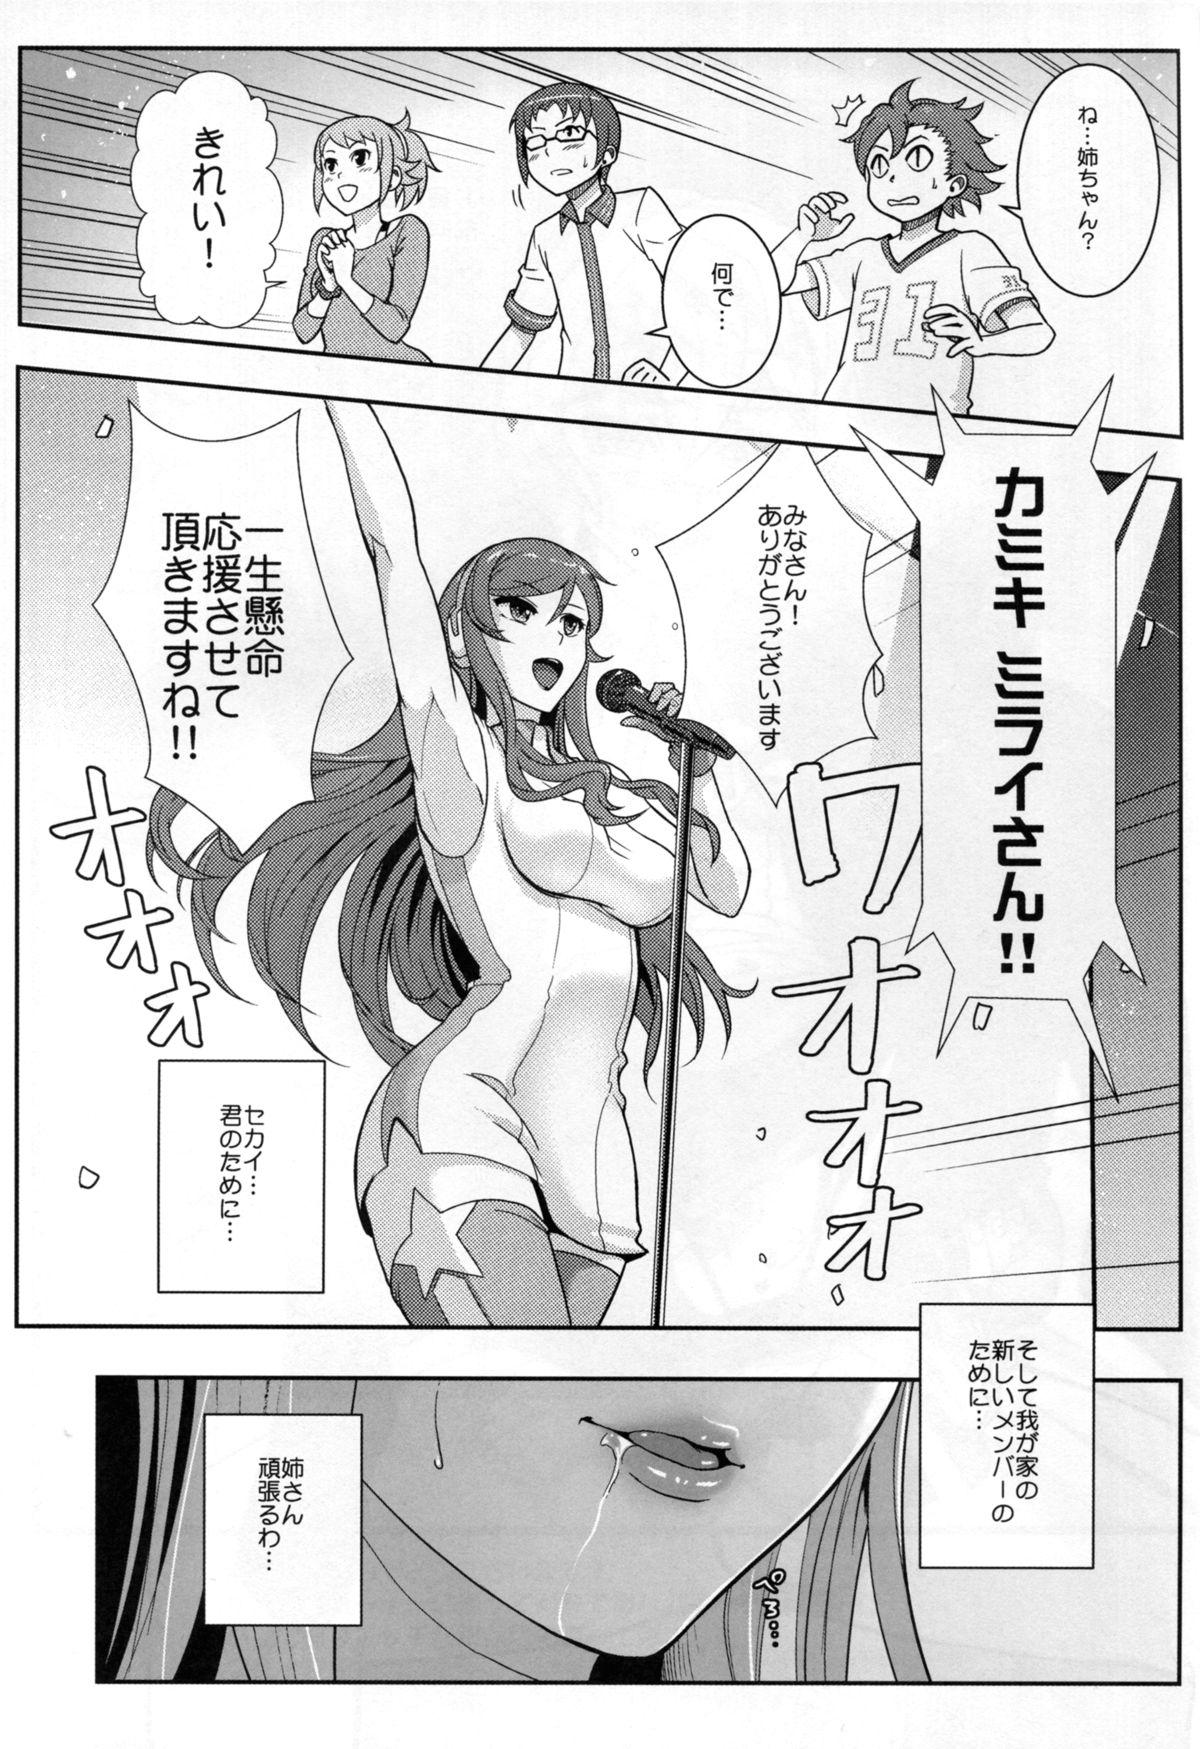 Gunpla Battle Image Character TRY!!! 26